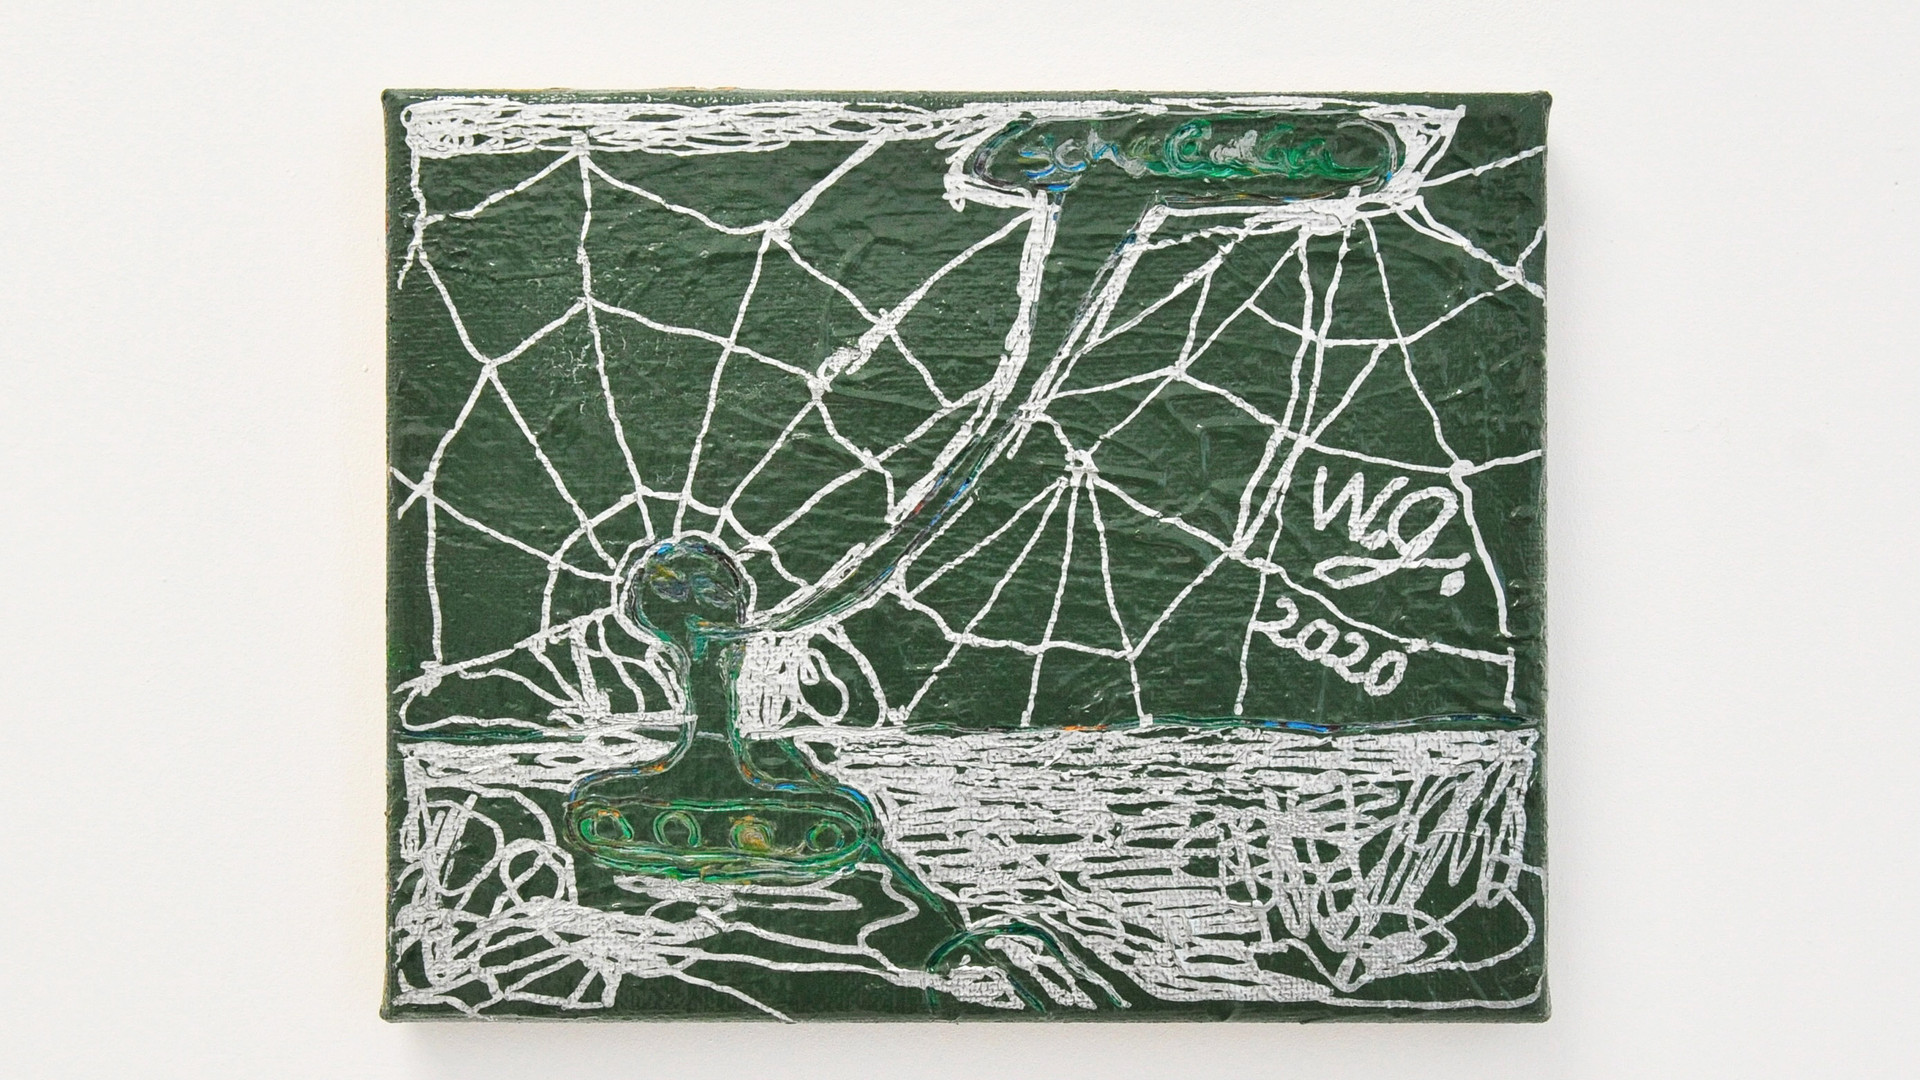 Ohne Titel / 2020 / 24x30cm / Acryl, Lack auf Leinwand   --  Wolfgang Günther / Emde Gallery / Soloshow / Mainz, 2020